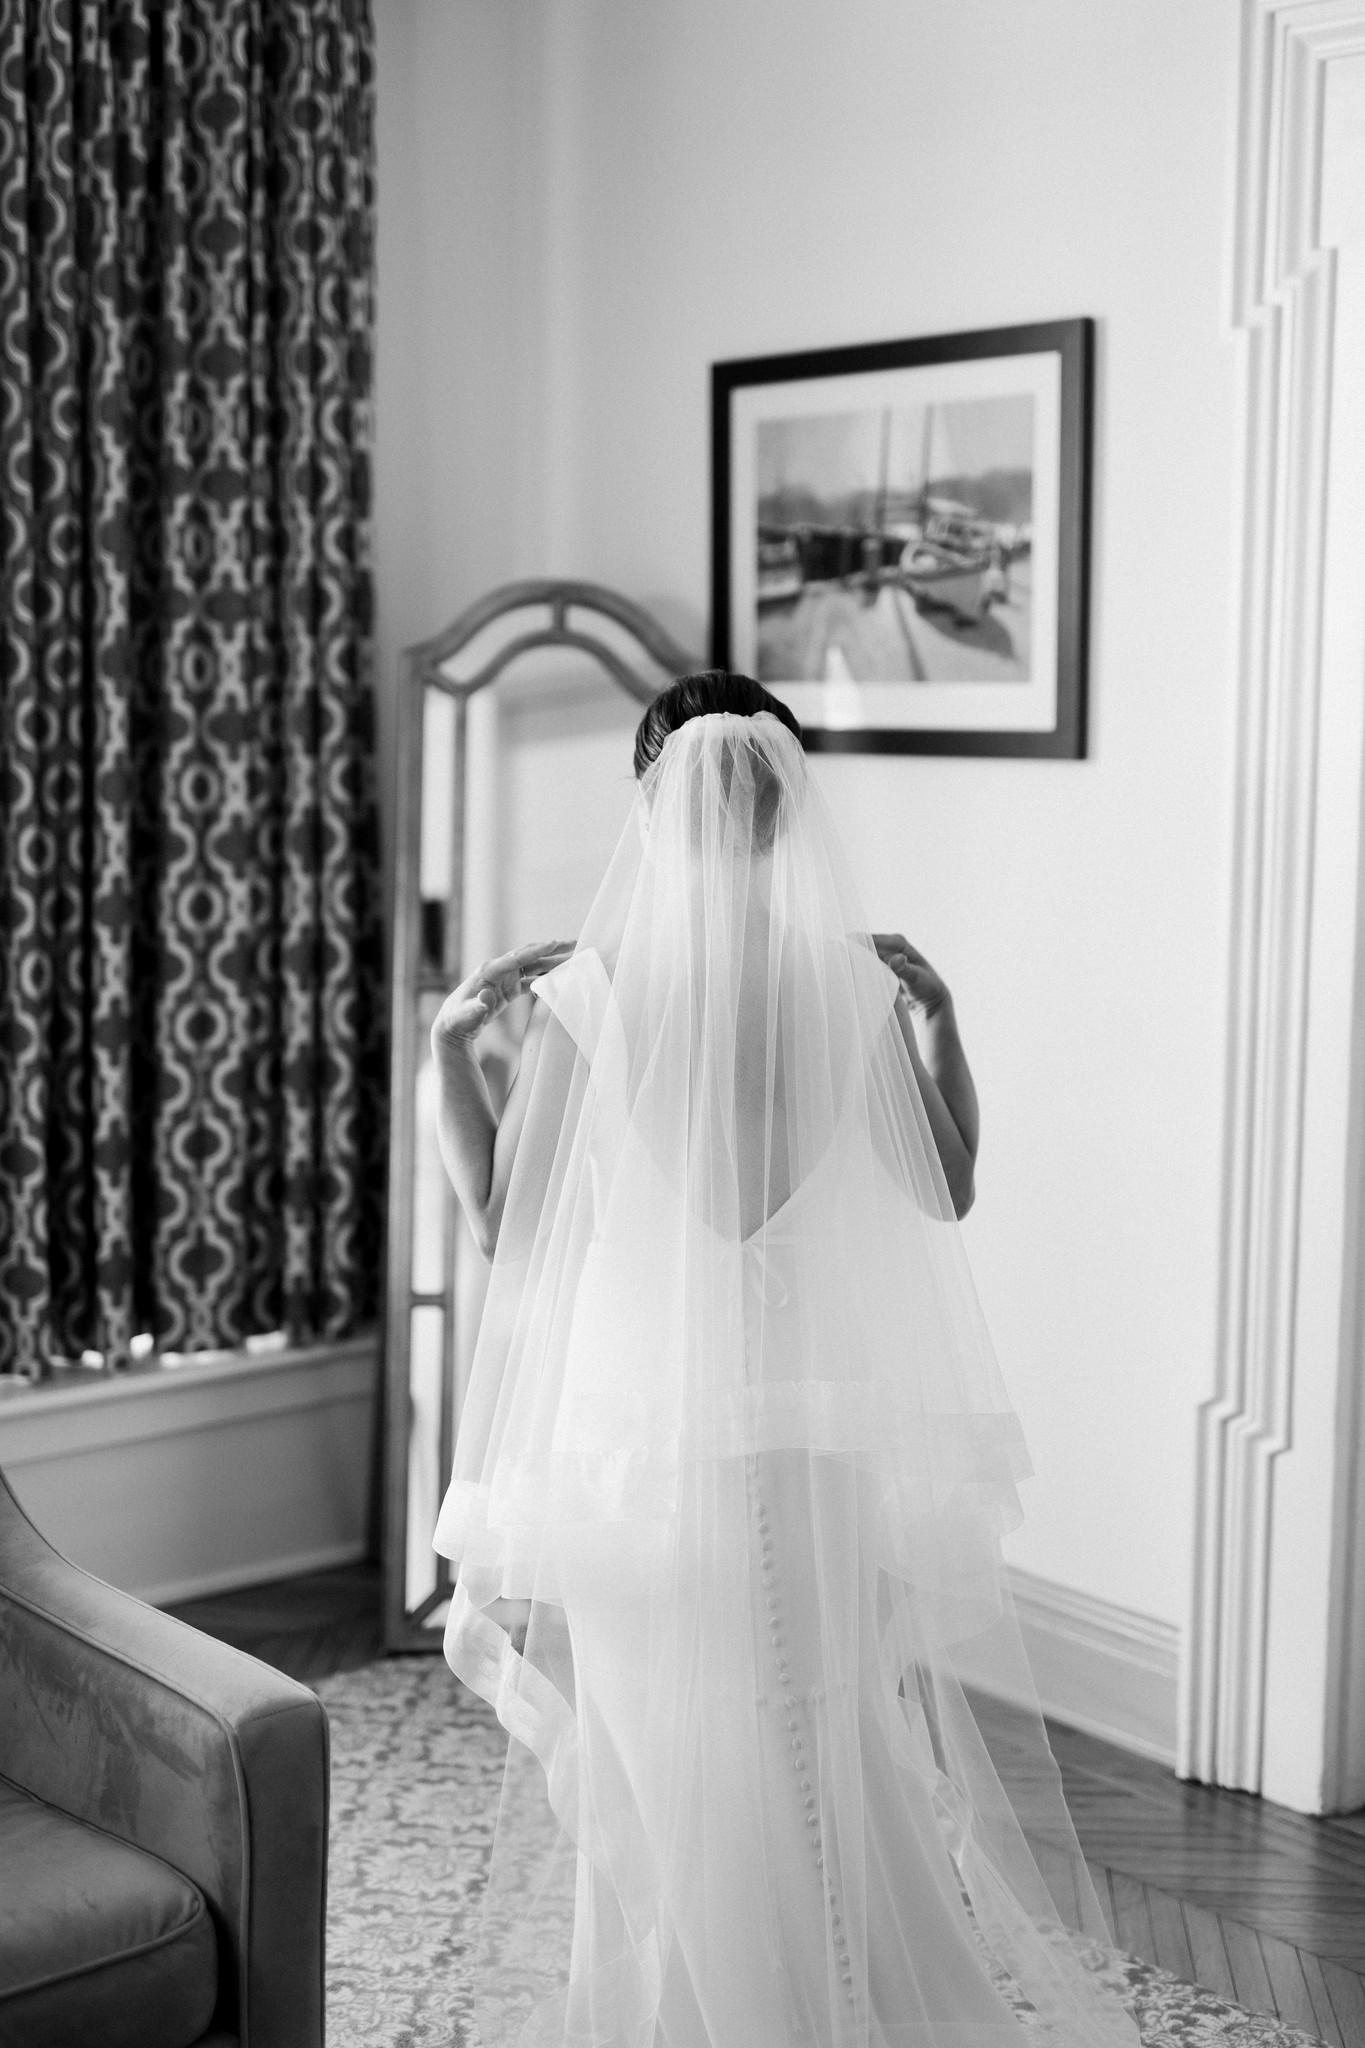 branford house wedding_ct wedding photographer_ct wedding-8_Easy-Resize.com.jpg